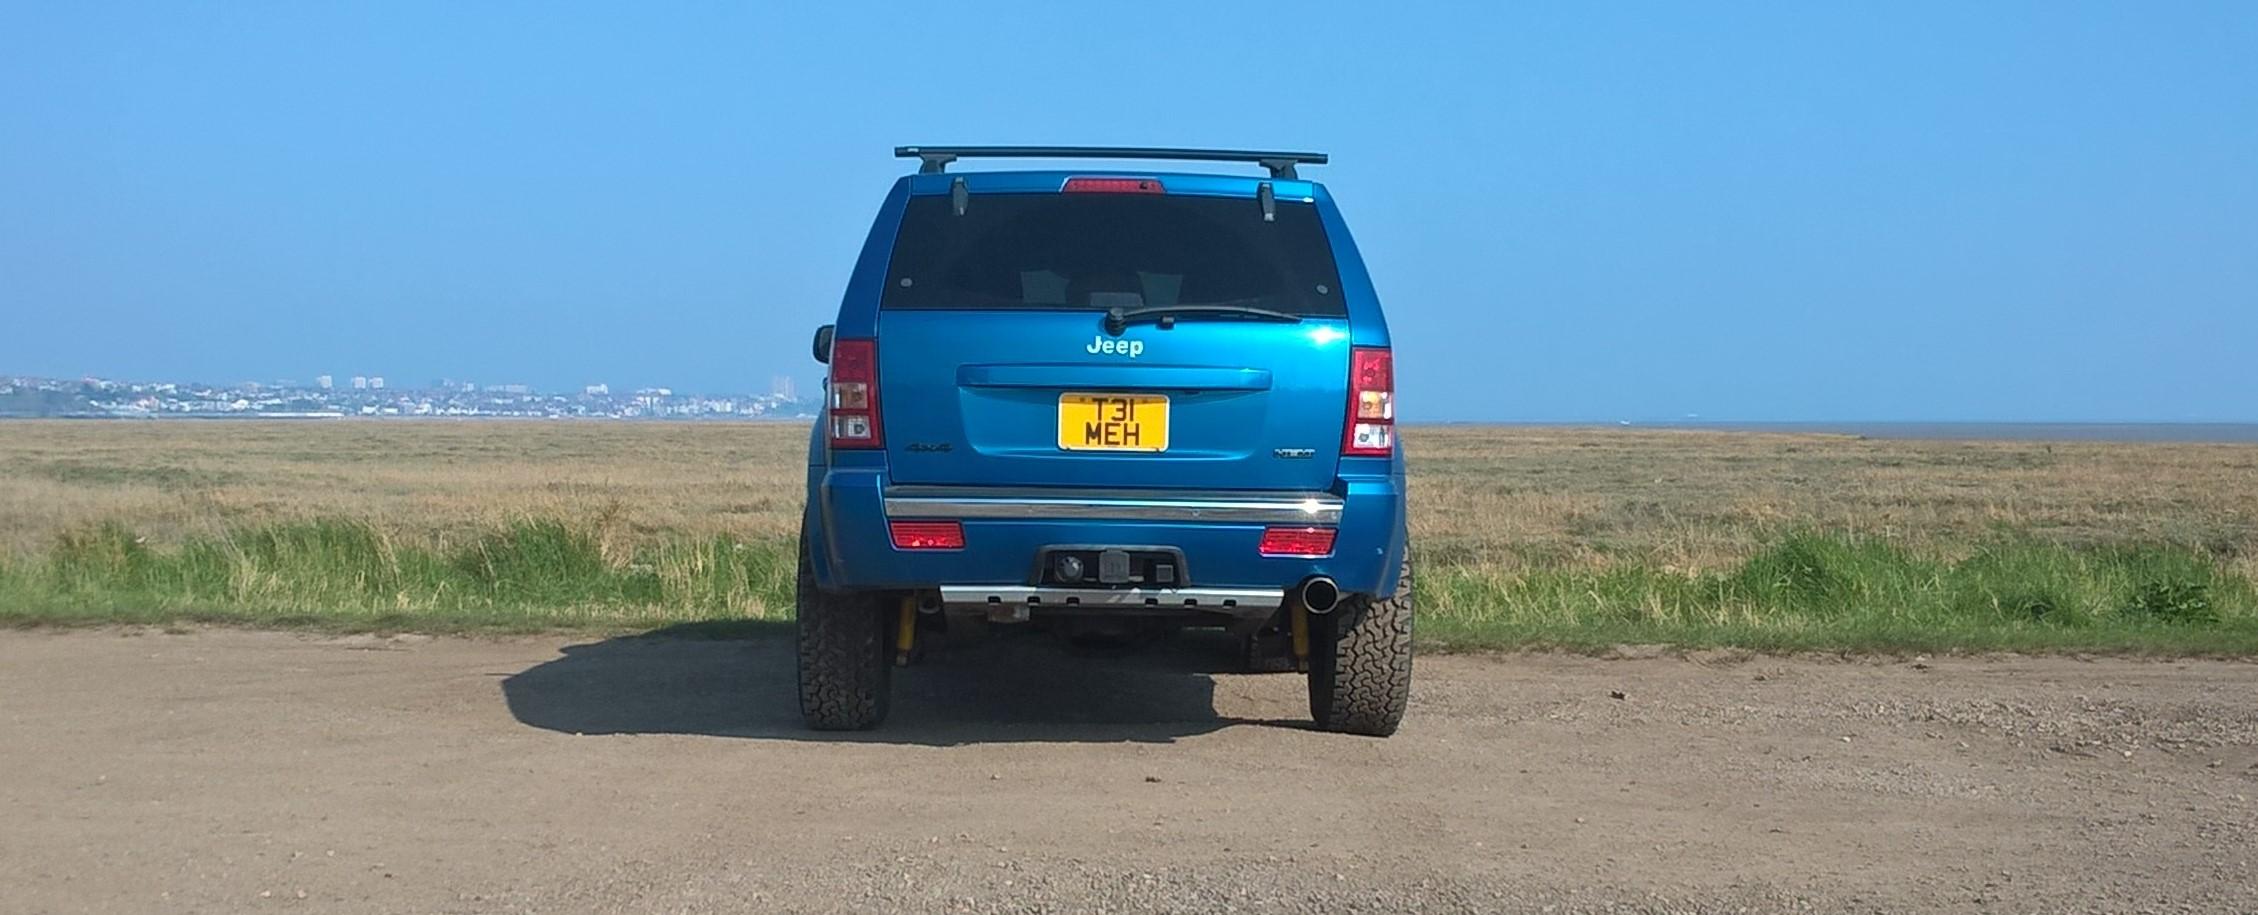 Jeep-wk-back